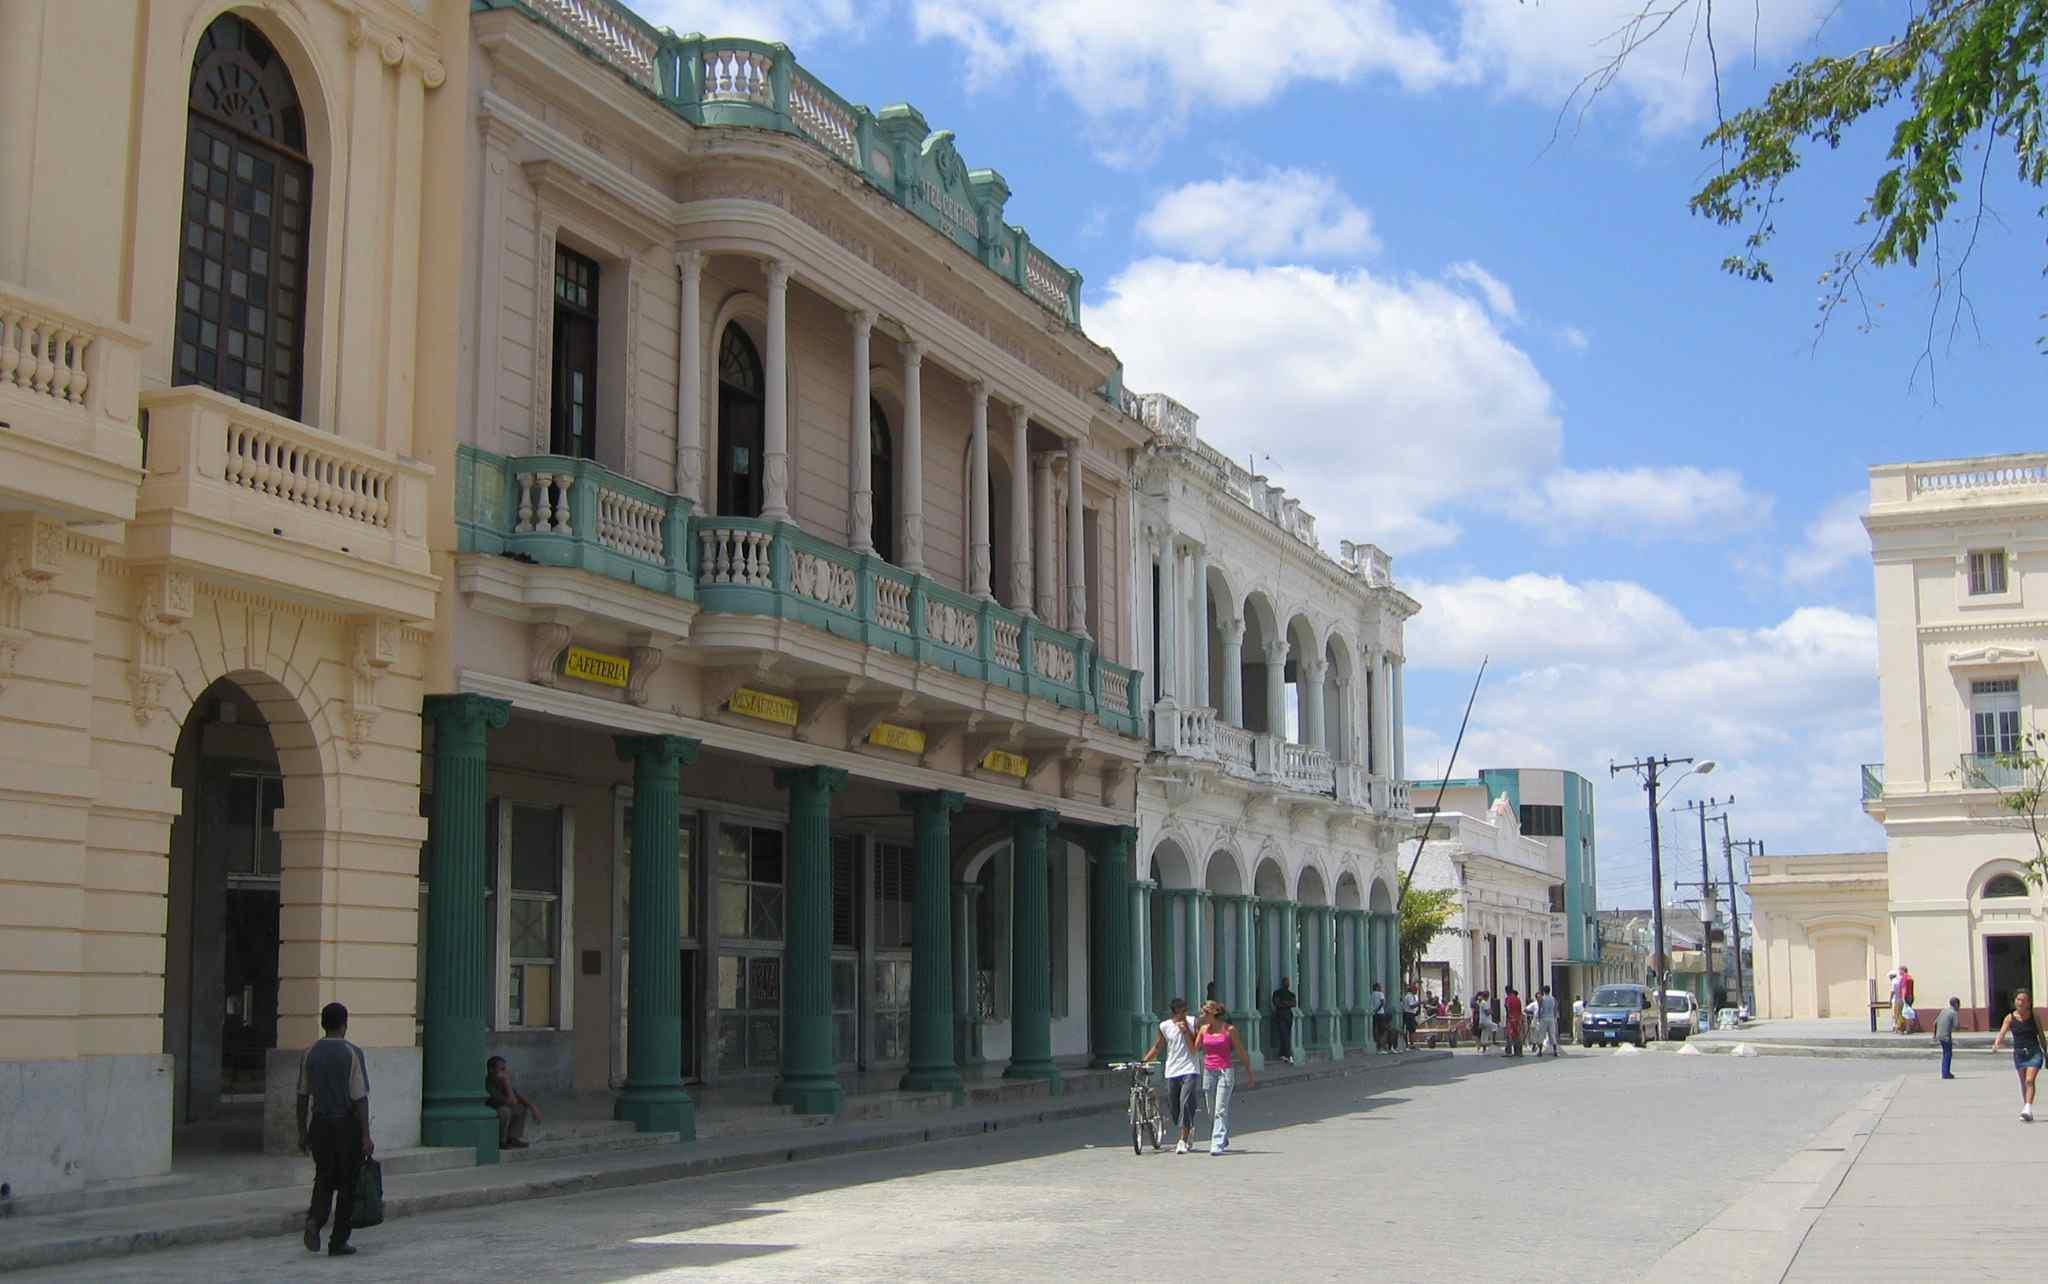 Calle Parque in Santa Clara, Cuba